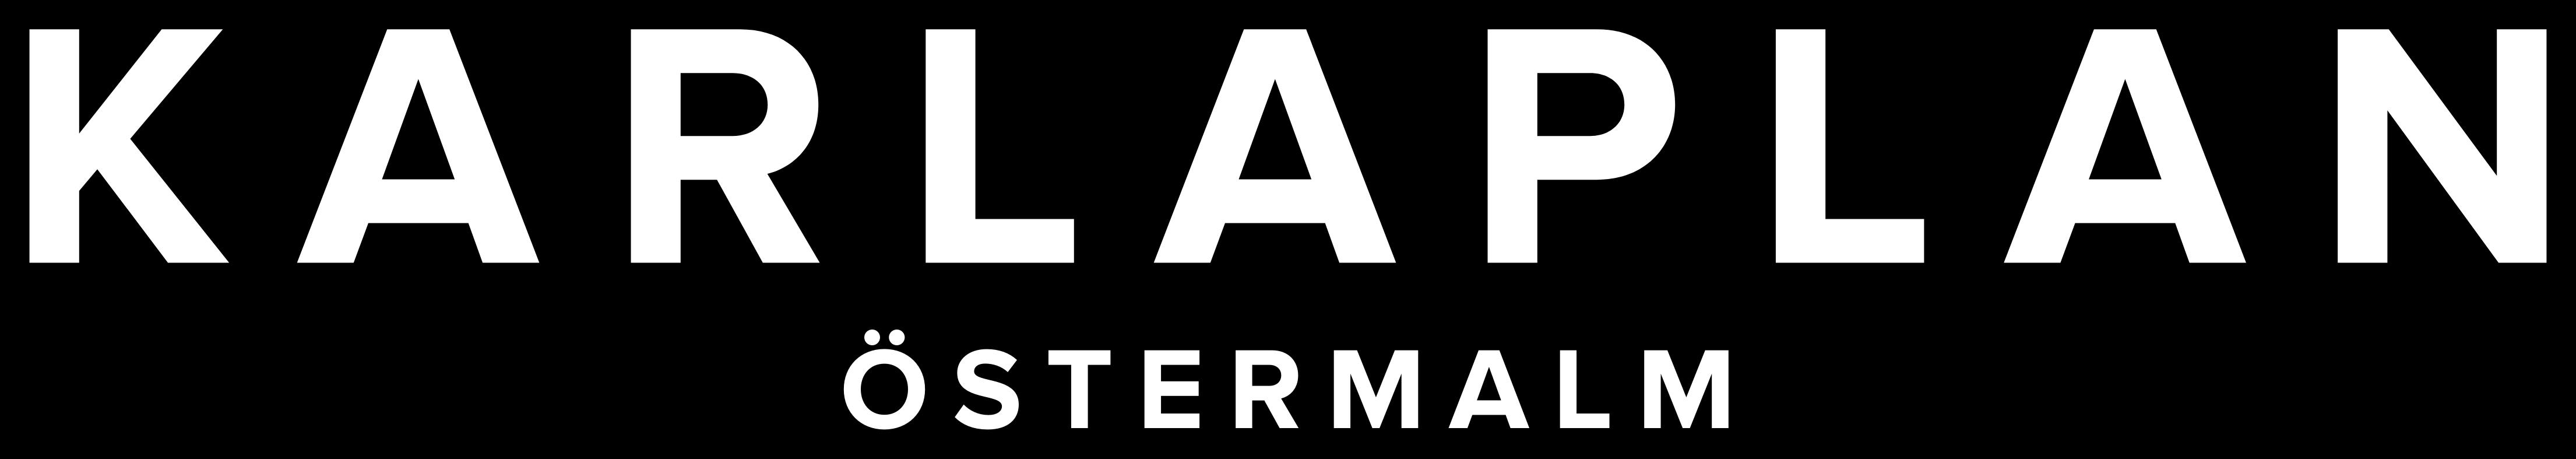 Logo Karlaplan - Östermalm - @karlaplan - karlaplan.com